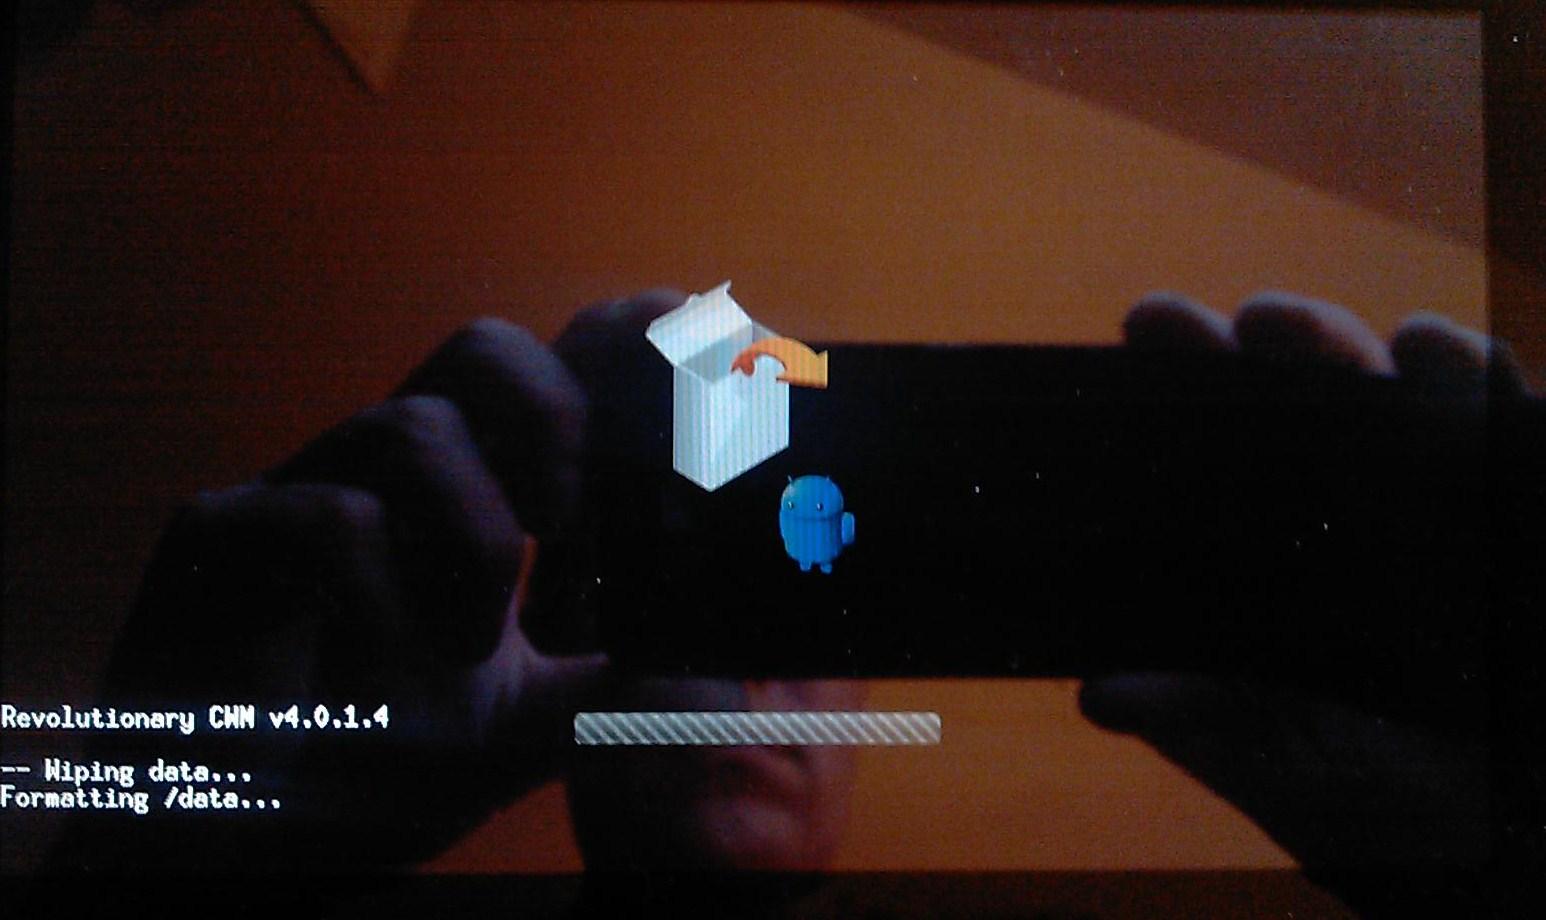 [Tuto] Downgrade vers GB, passage en S.Off, installation Leedroid GB 2.2.0 (en images) 871738IMAG0009